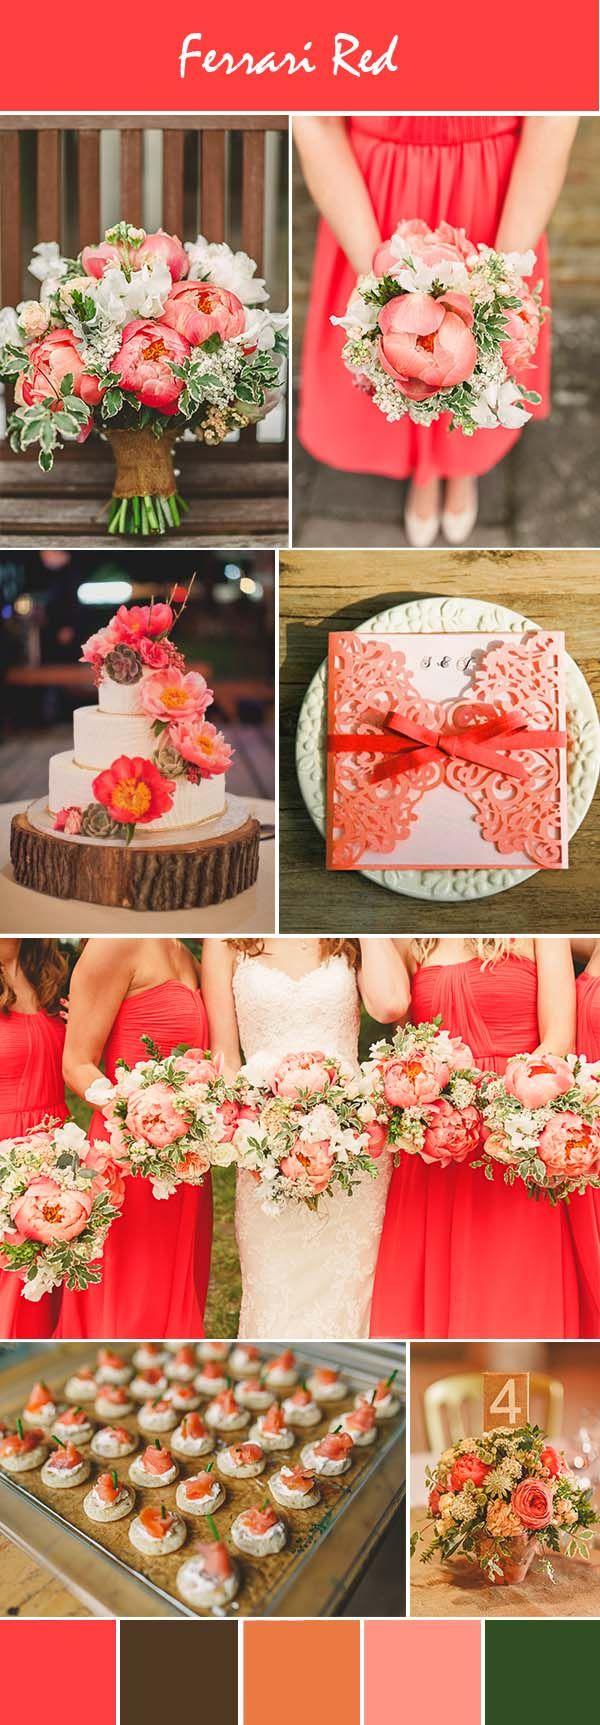 vibrant pink rustic wedding ideas and invitations